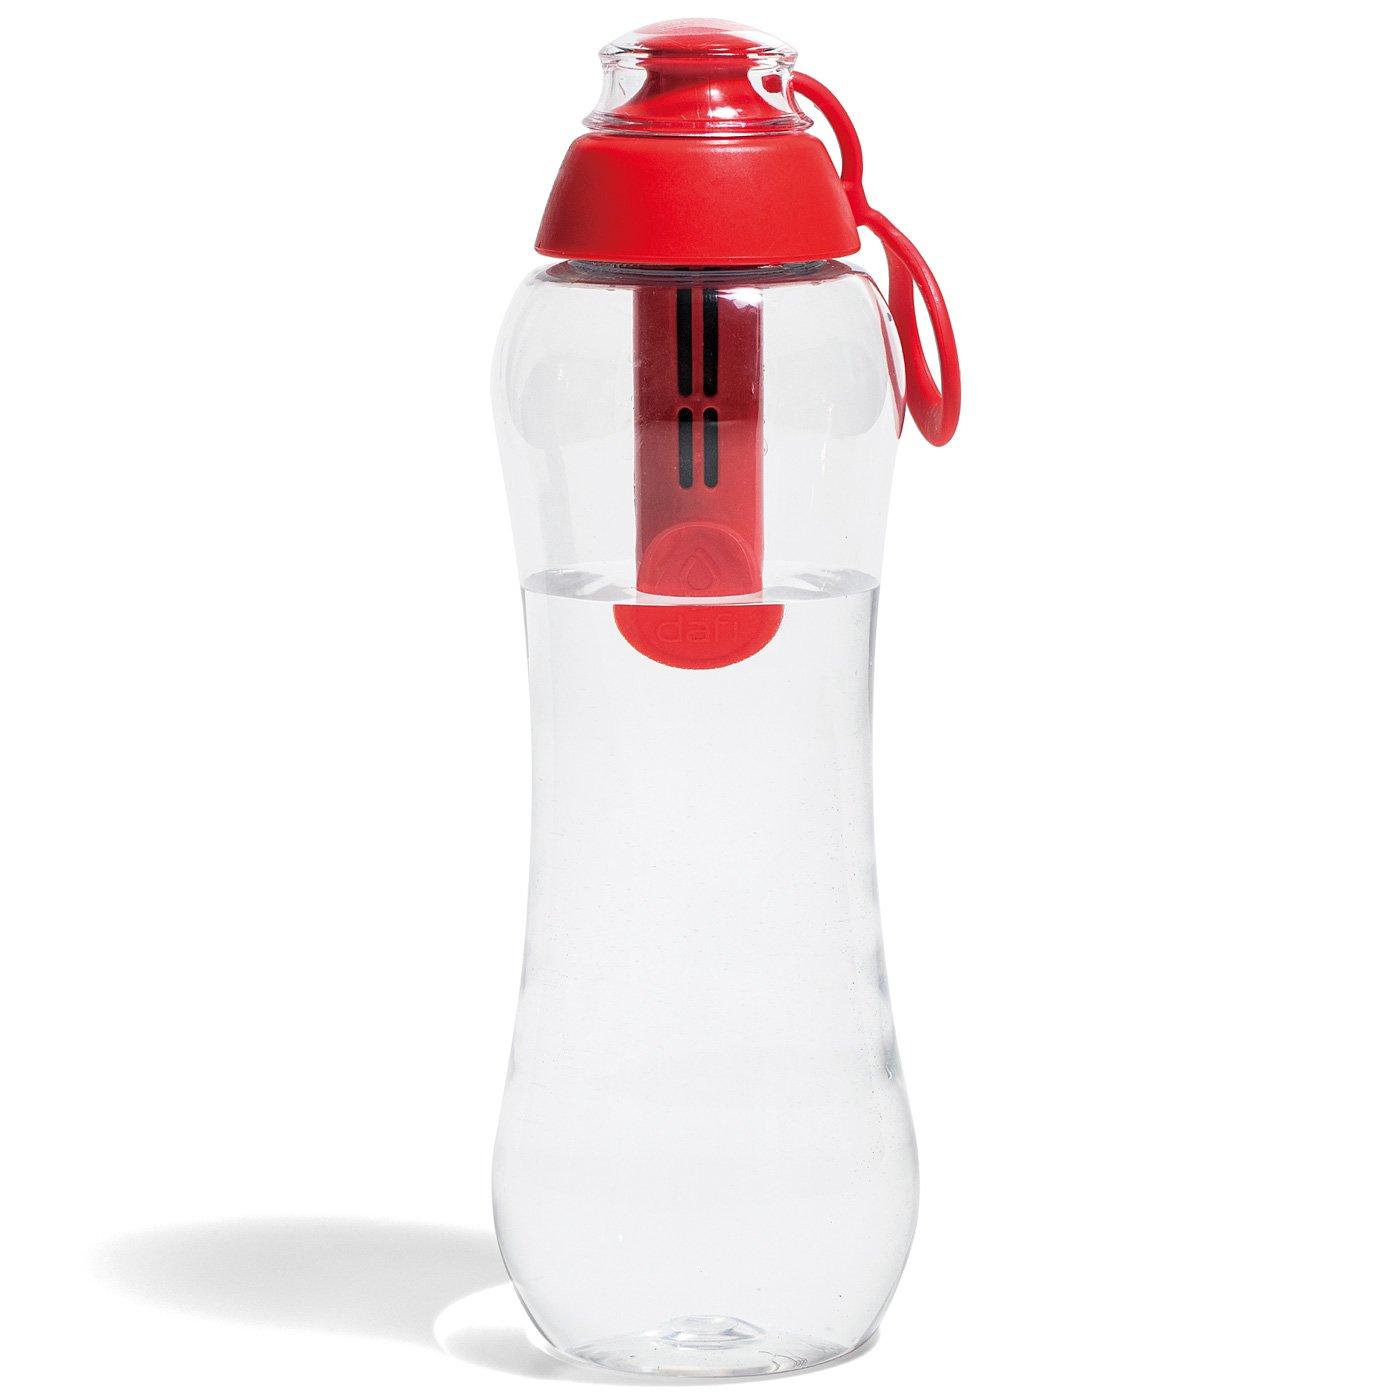 UP.de UP.de 携帯用浄水ボトル専用 浄水カートリッジ2個&キャップ